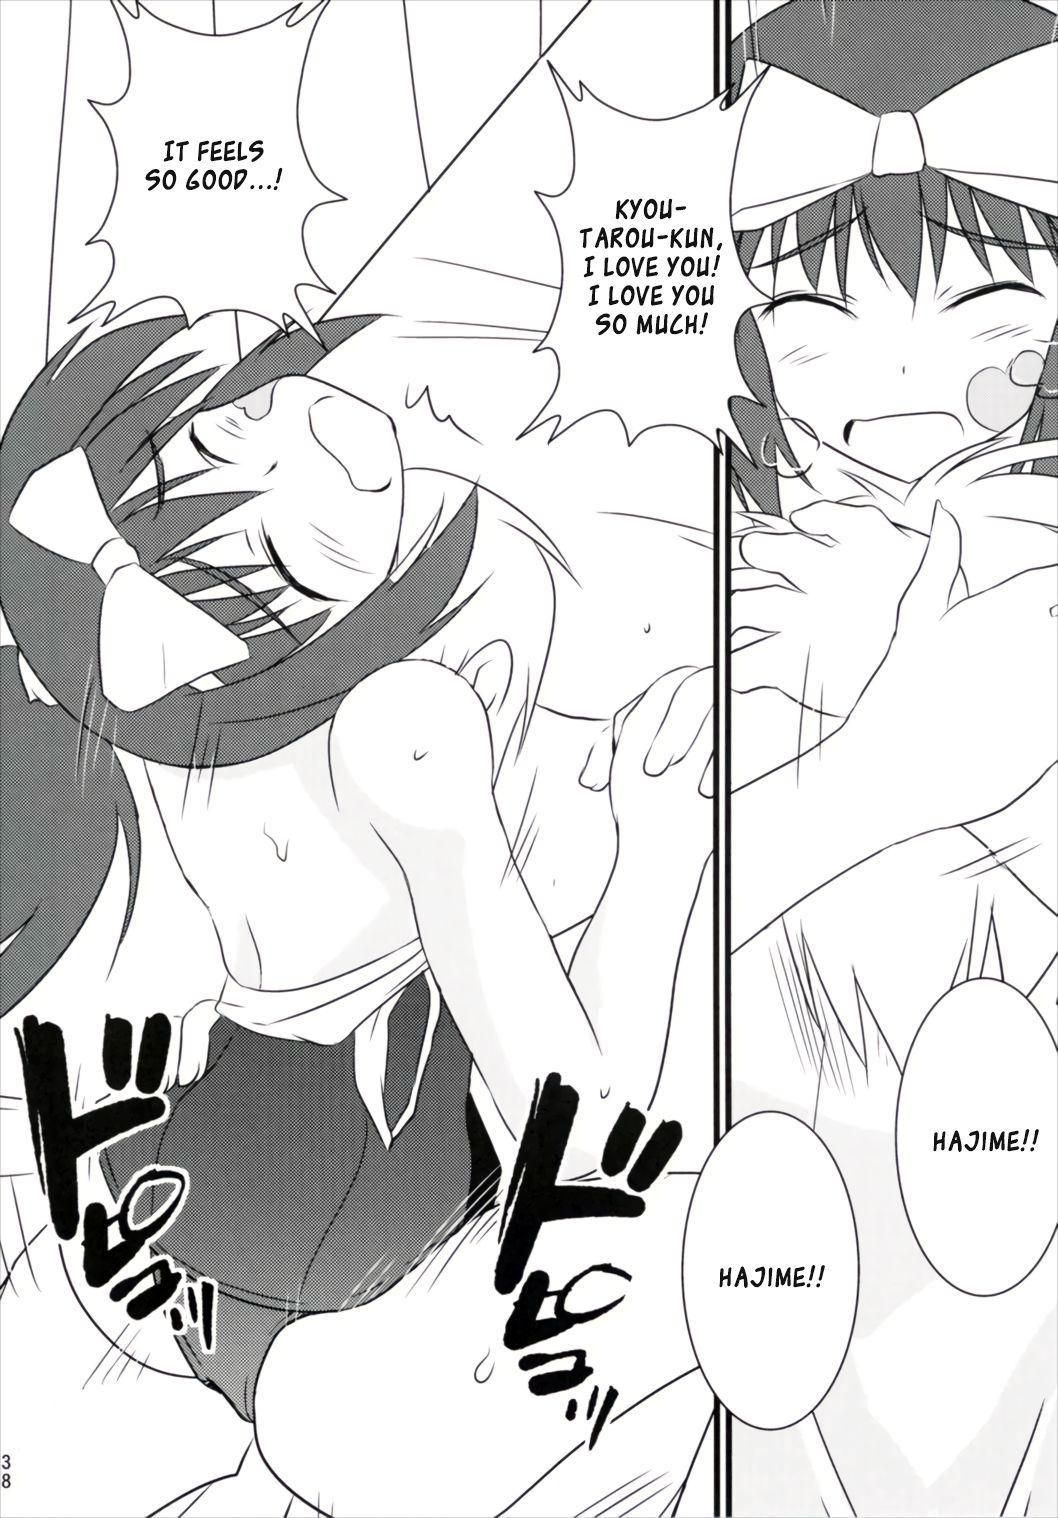 Hajimete no Sailor Fuku | Hajime's First Sailor Suit 37